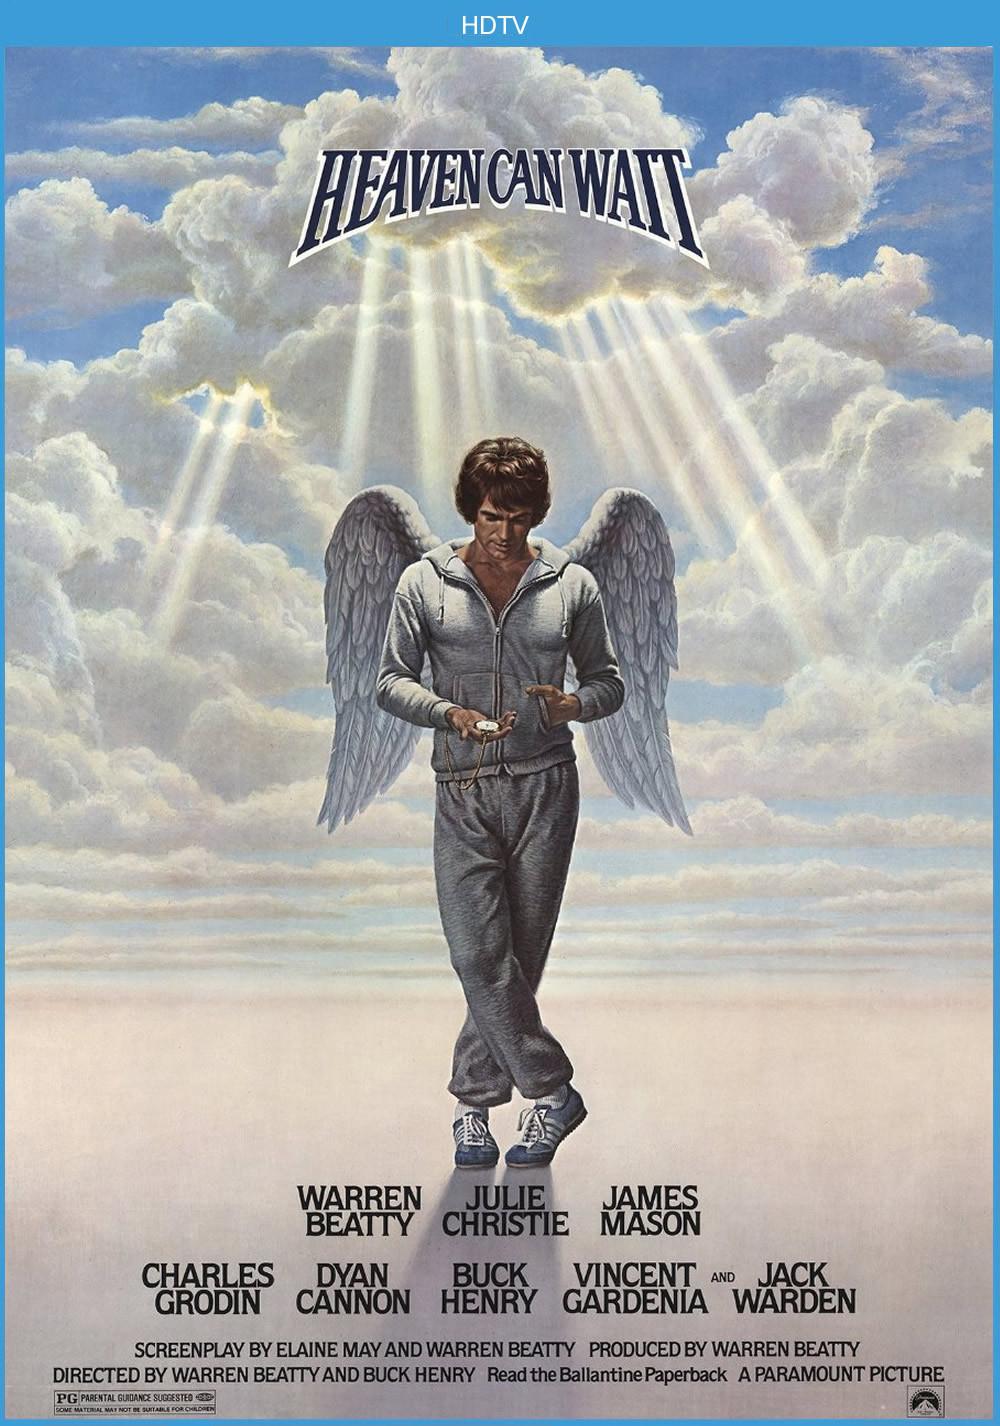 O Céu Pode Esperar (Heaven Can Wait: 1978)